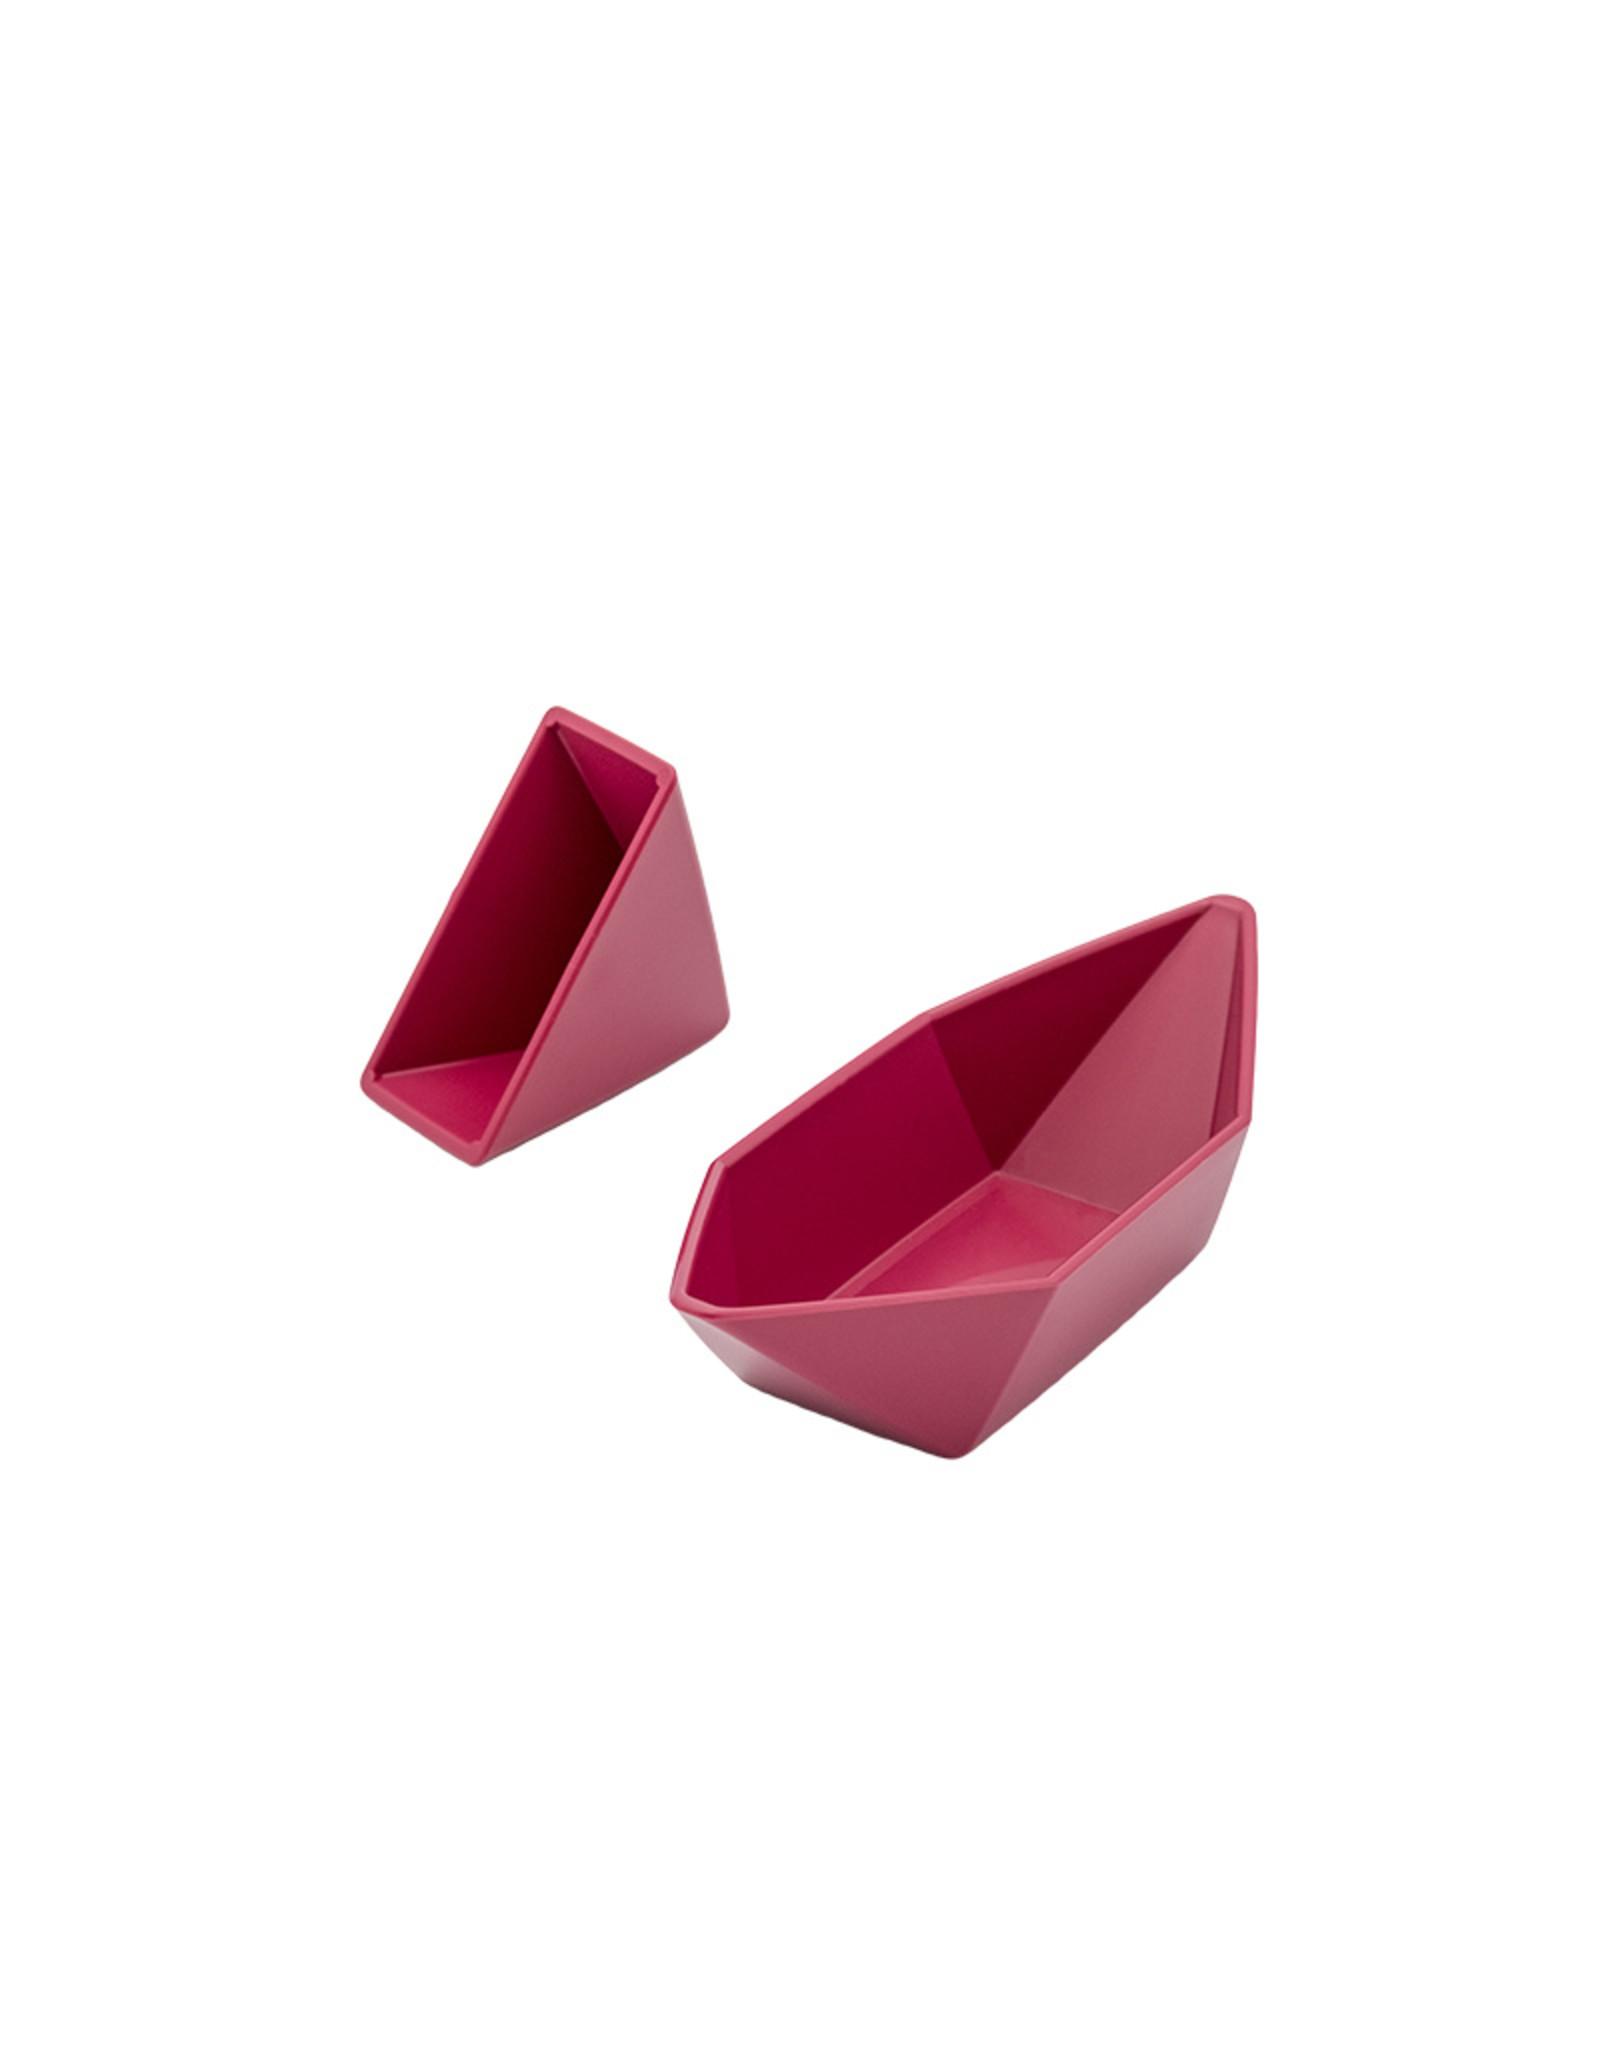 Zsilt Zsilt - Bootje van gerecycled plastic